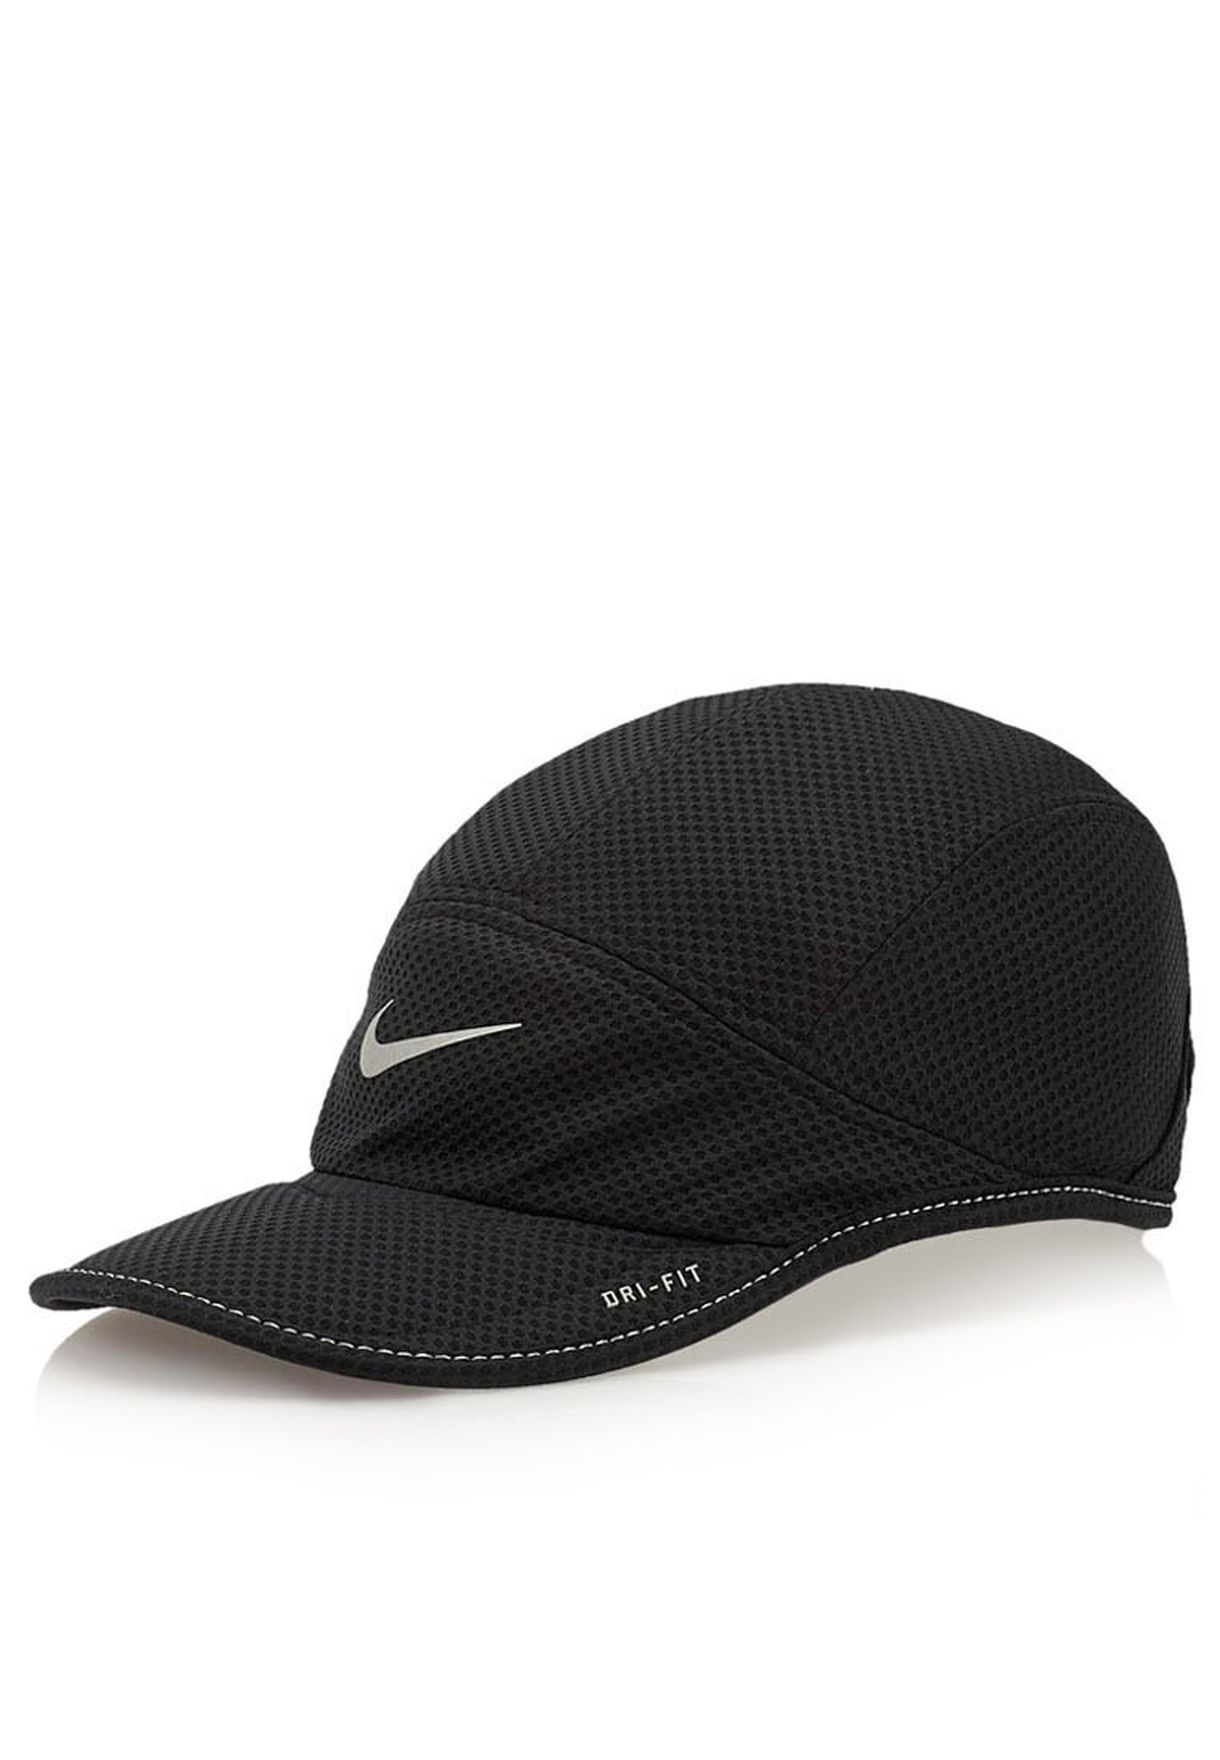 adad875702b71 ... canada shop nike black mesh daybreak cap nkap520787 010 for men in oman  ni727ac11xie b98a8 6dc66